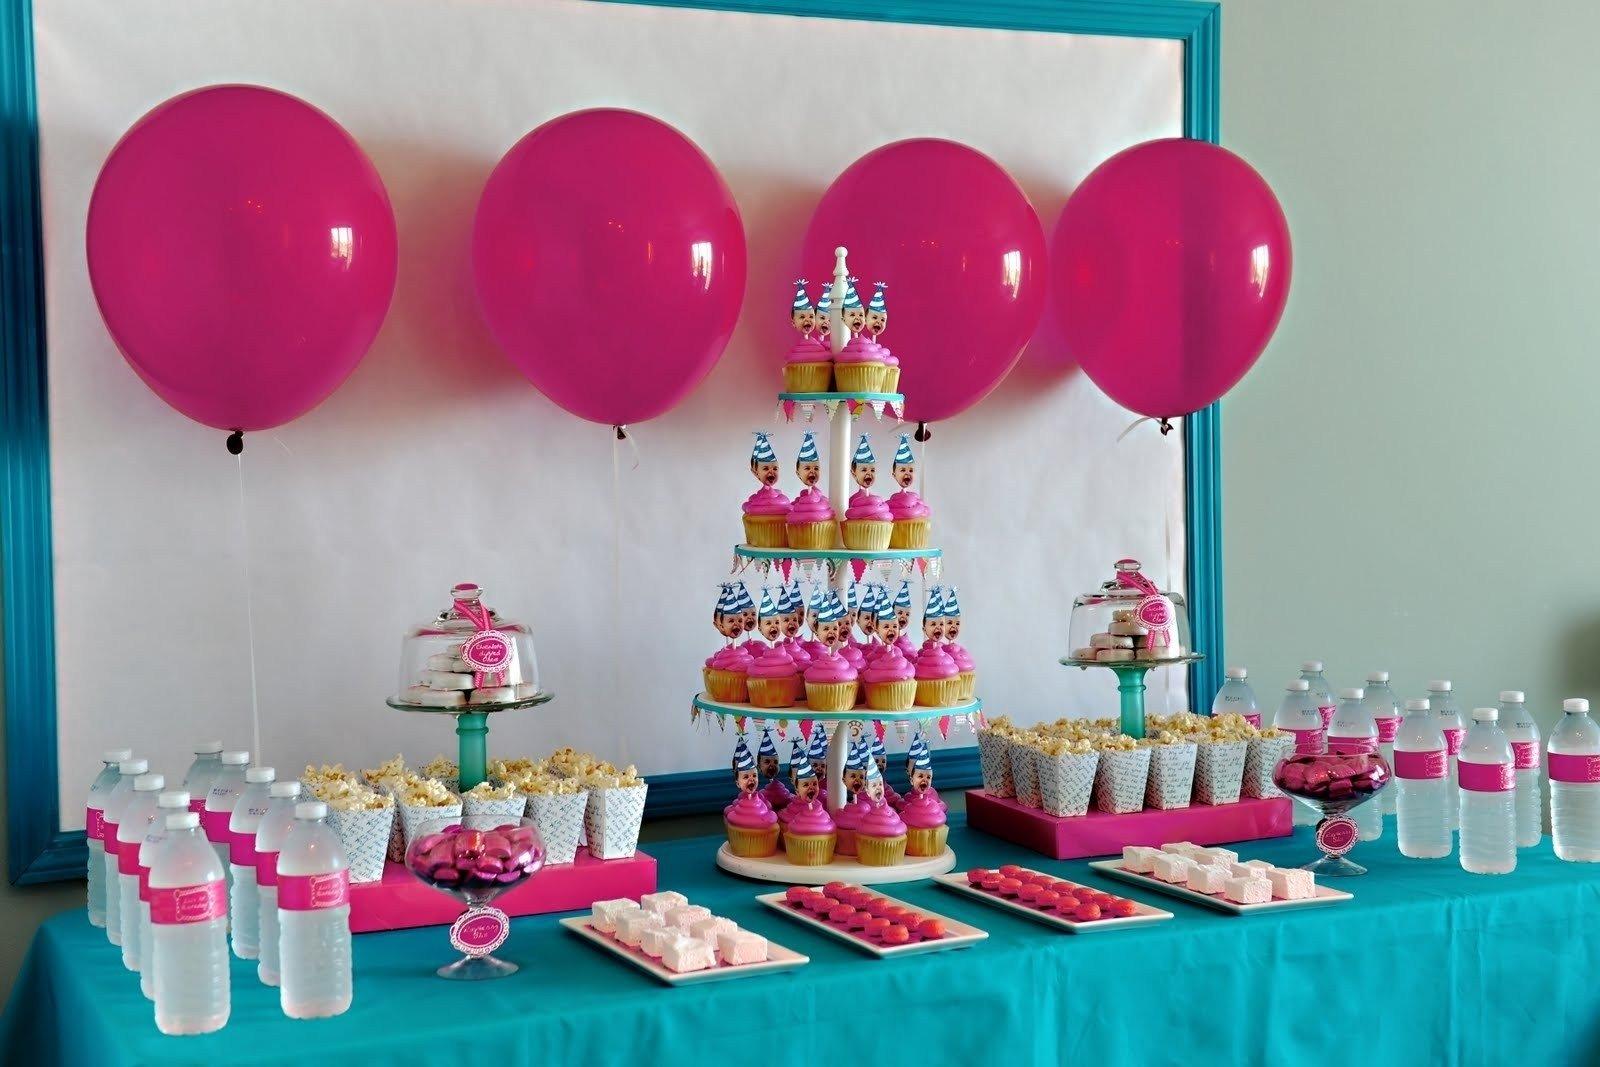 10 Lovely 1 Year Birthday Party Ideas cute year birthday party ideas entertainment ideas for visit 31 2020